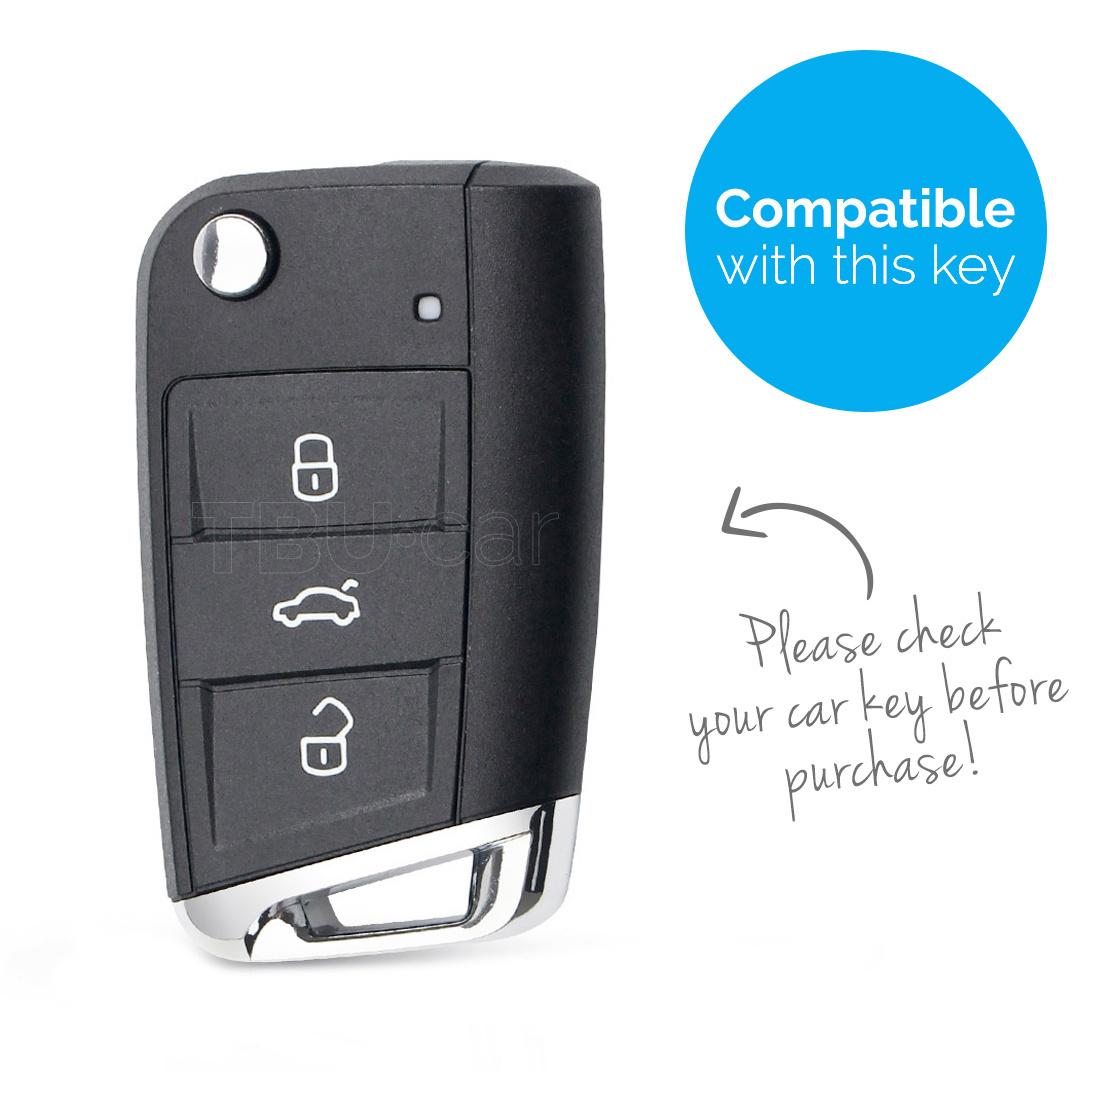 TBU car TBU car Sleutel cover compatibel met VW - TPU sleutel hoesje / beschermhoesje autosleutel - Roségoud